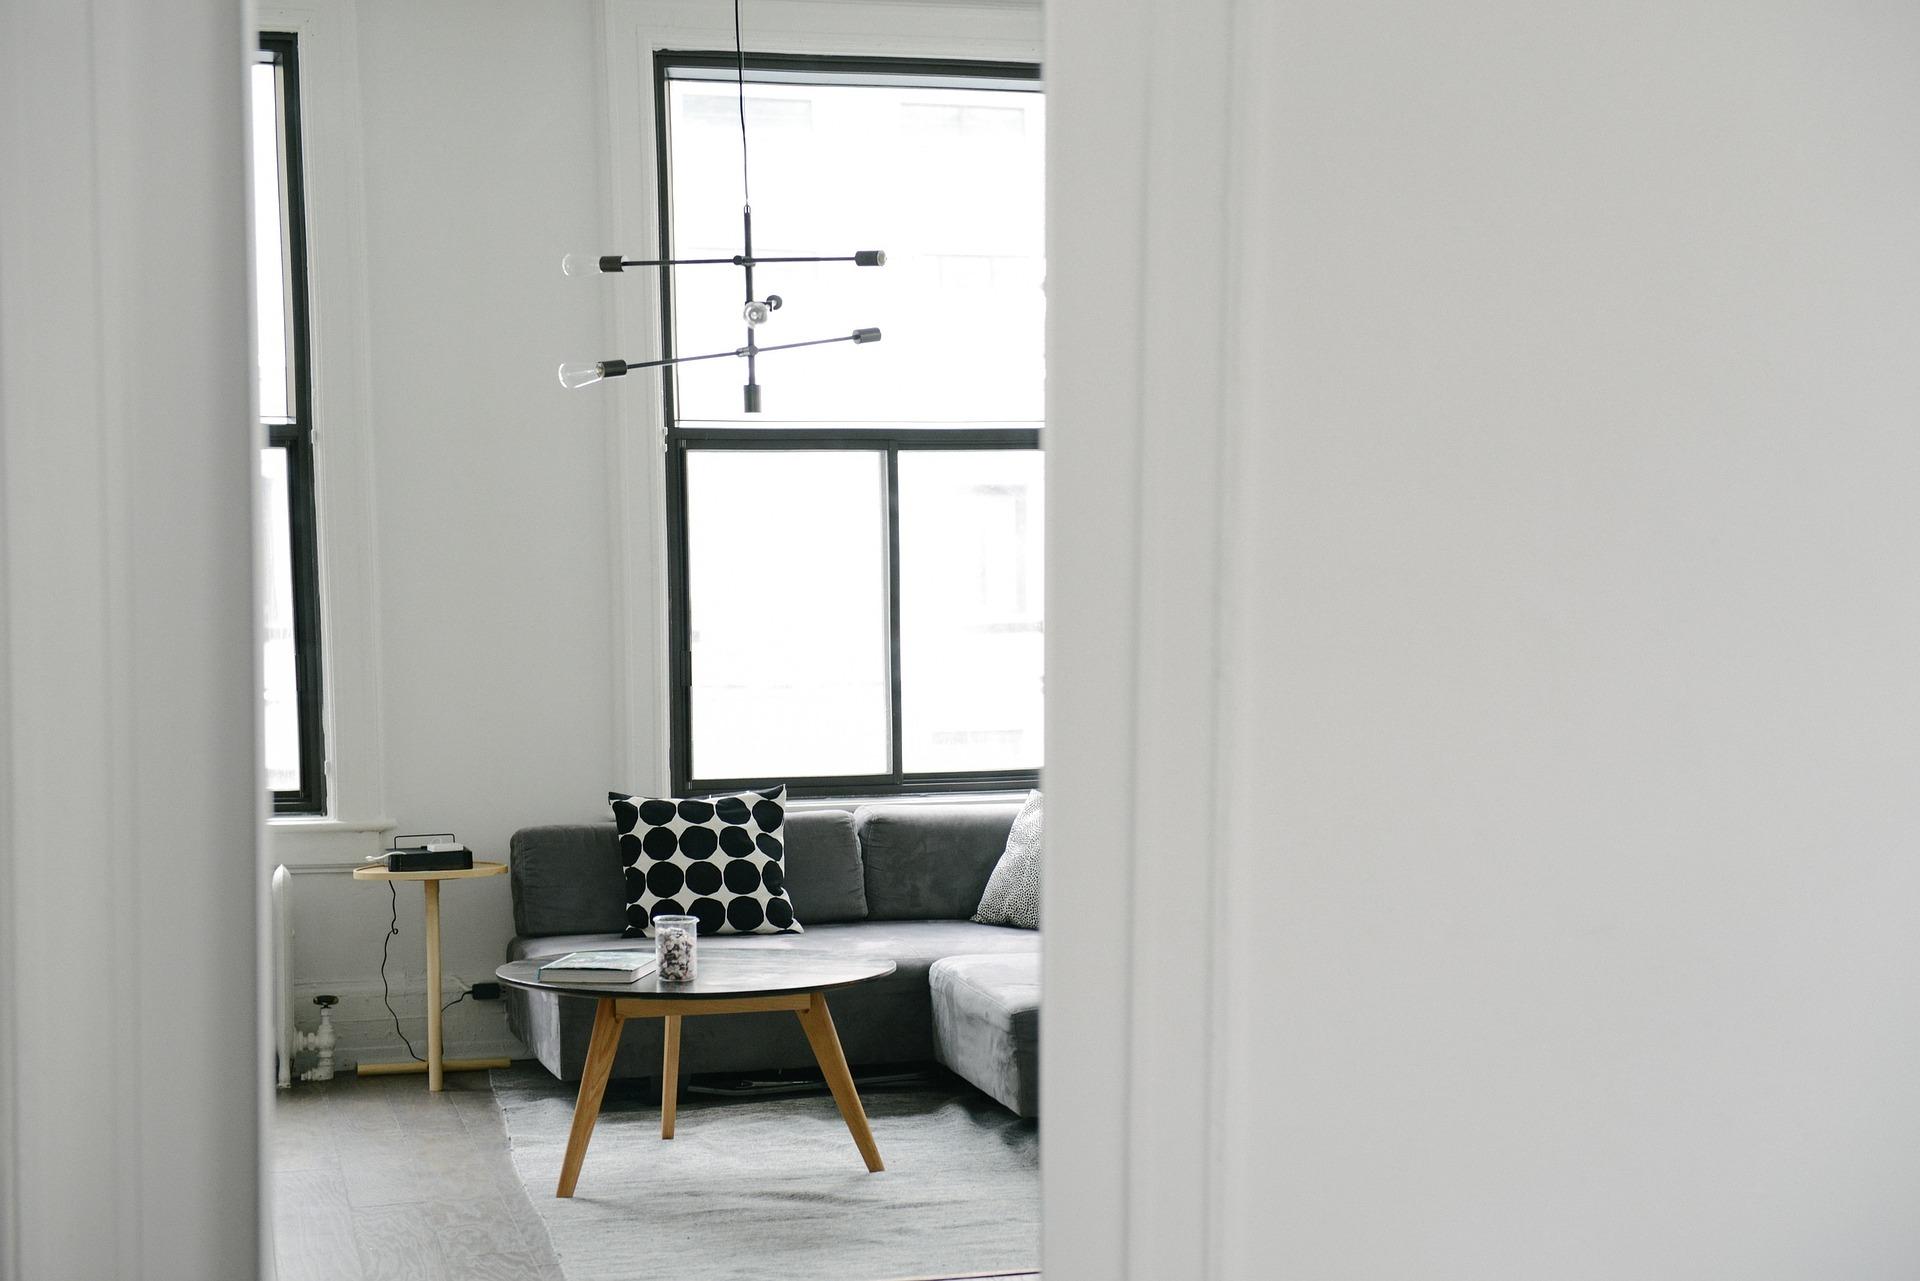 https://pixabay.com/photos/doorway-entrance-living-room-room-690338/